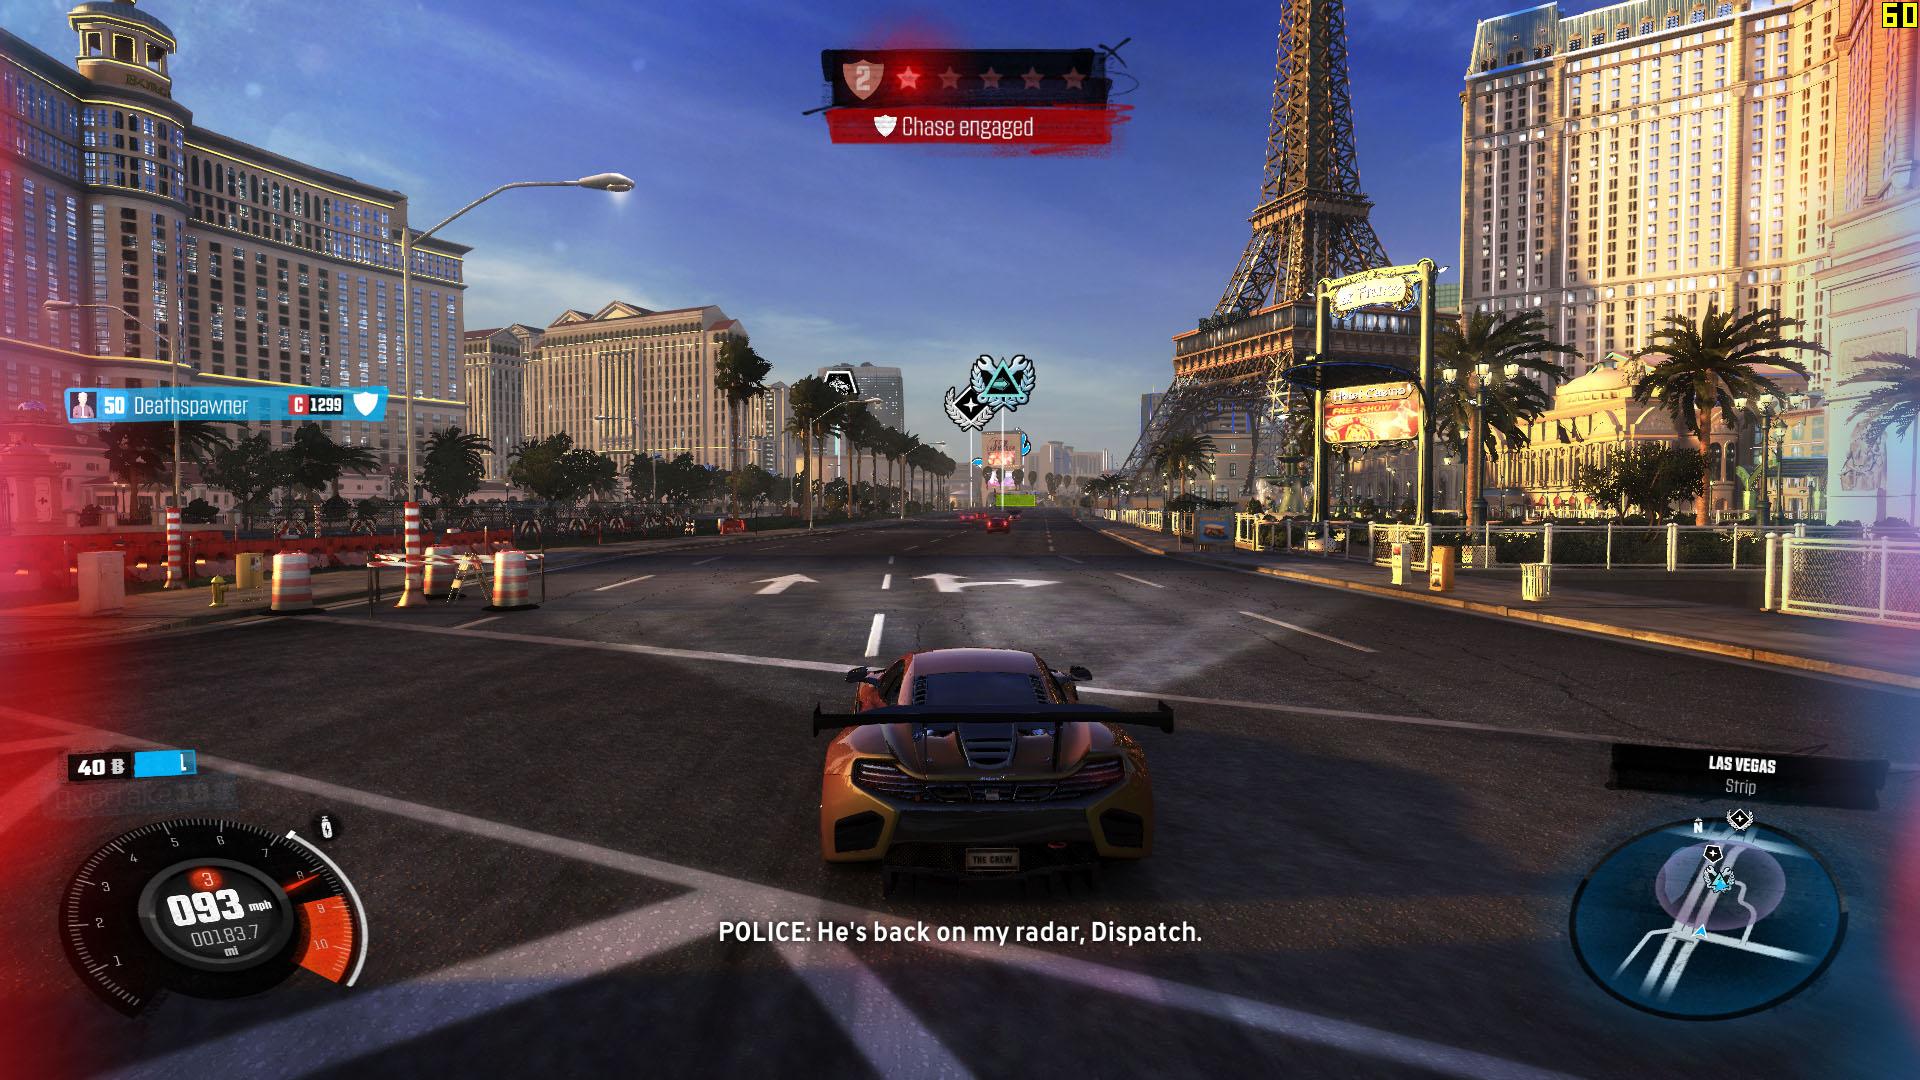 ASUS ROG G20 Gaming PC – The Crew – Techgage